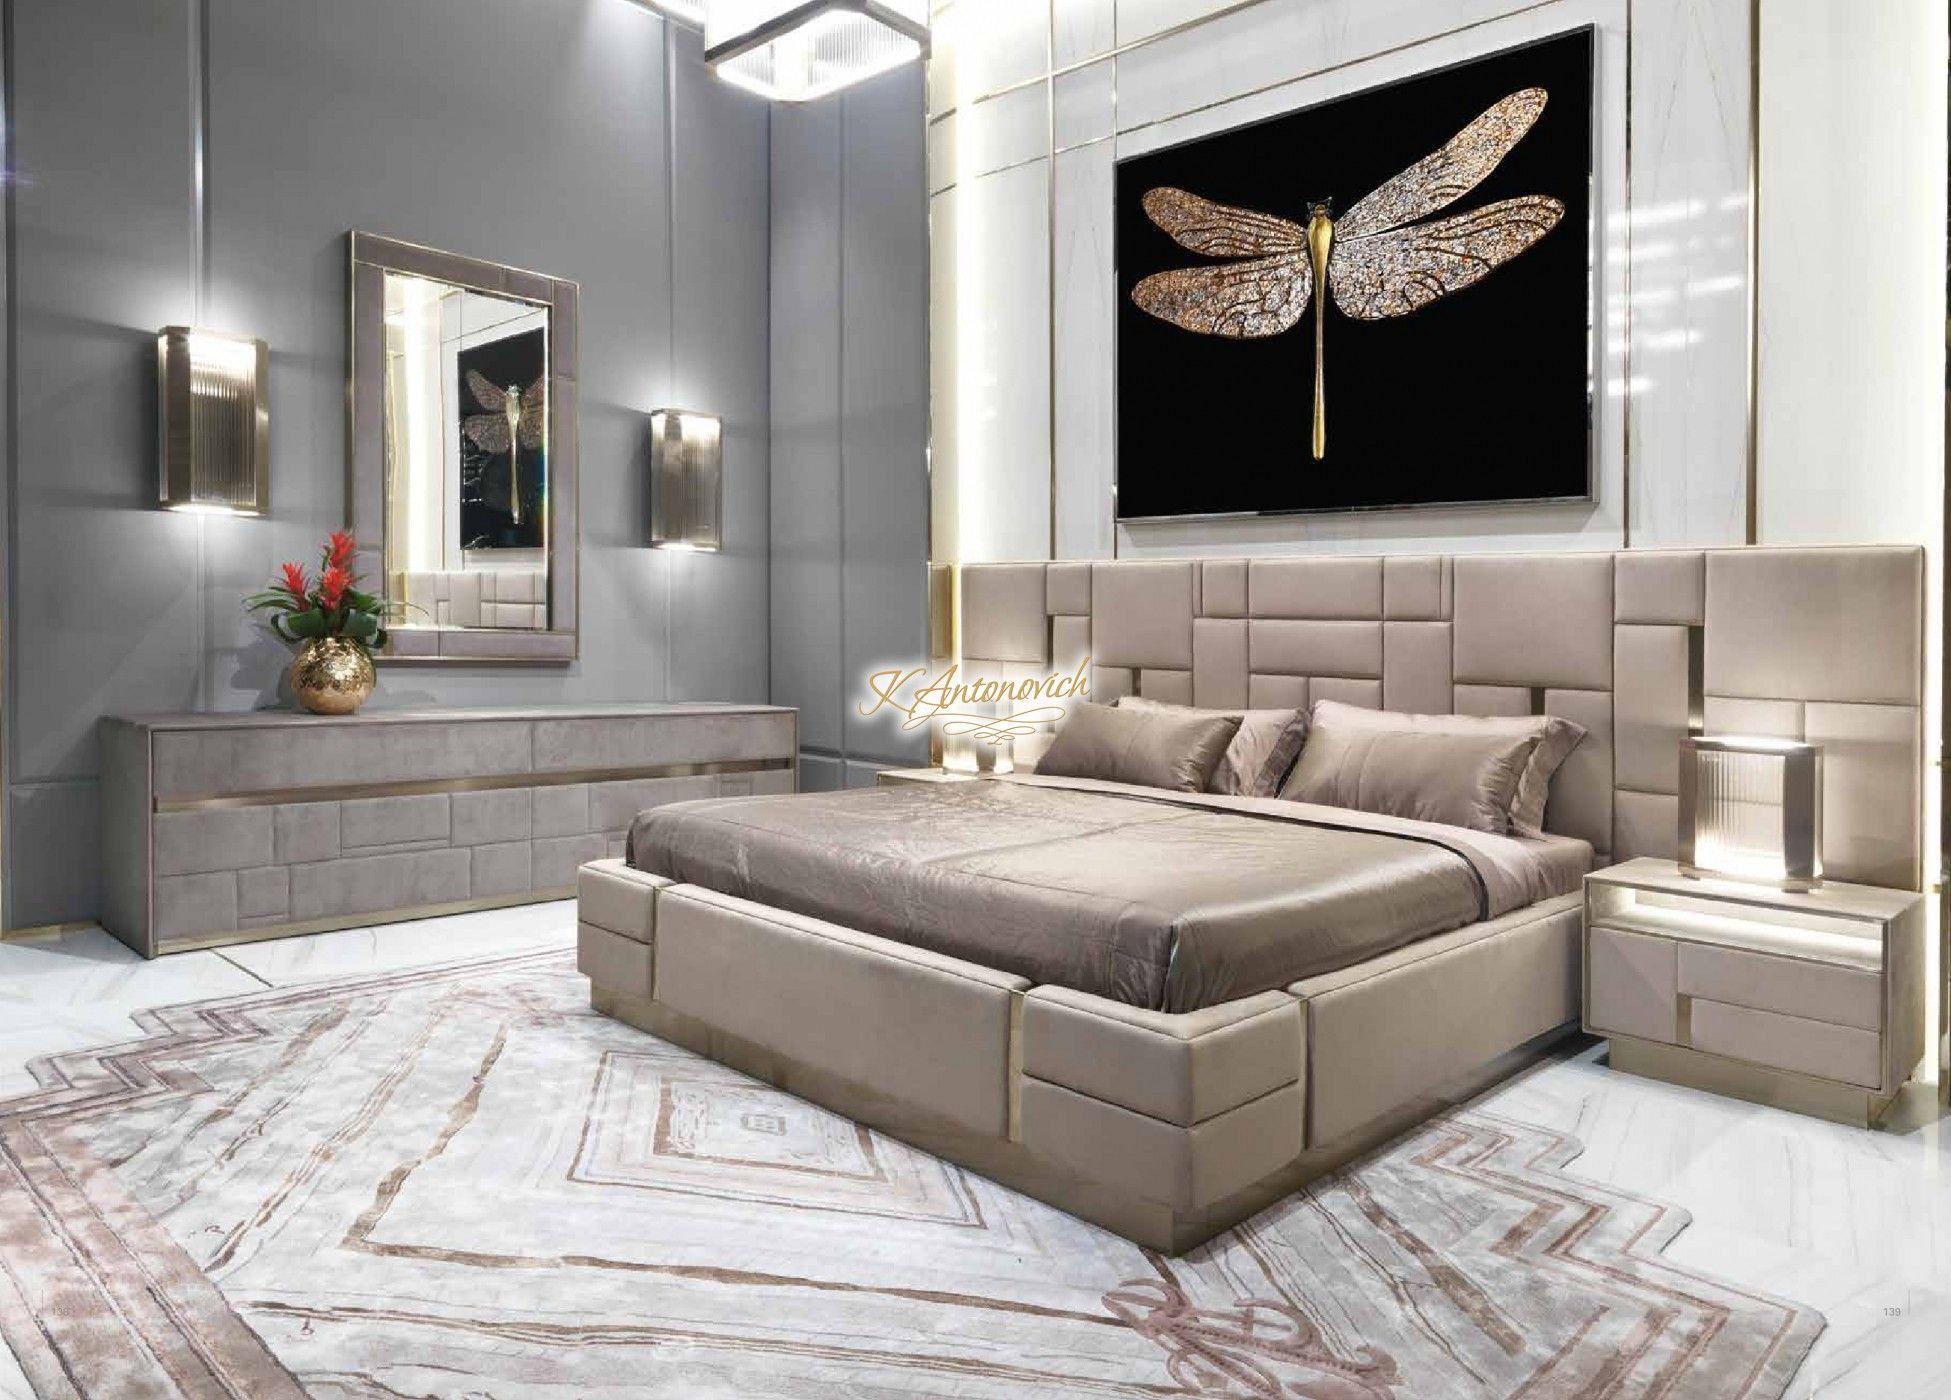 10 Luxury Bedroom Ideas Stunning Luxury Beds In Glamorous Bedrooms Modern Luxury Bedroom Bedroom Furniture Design Glamourous Bedroom